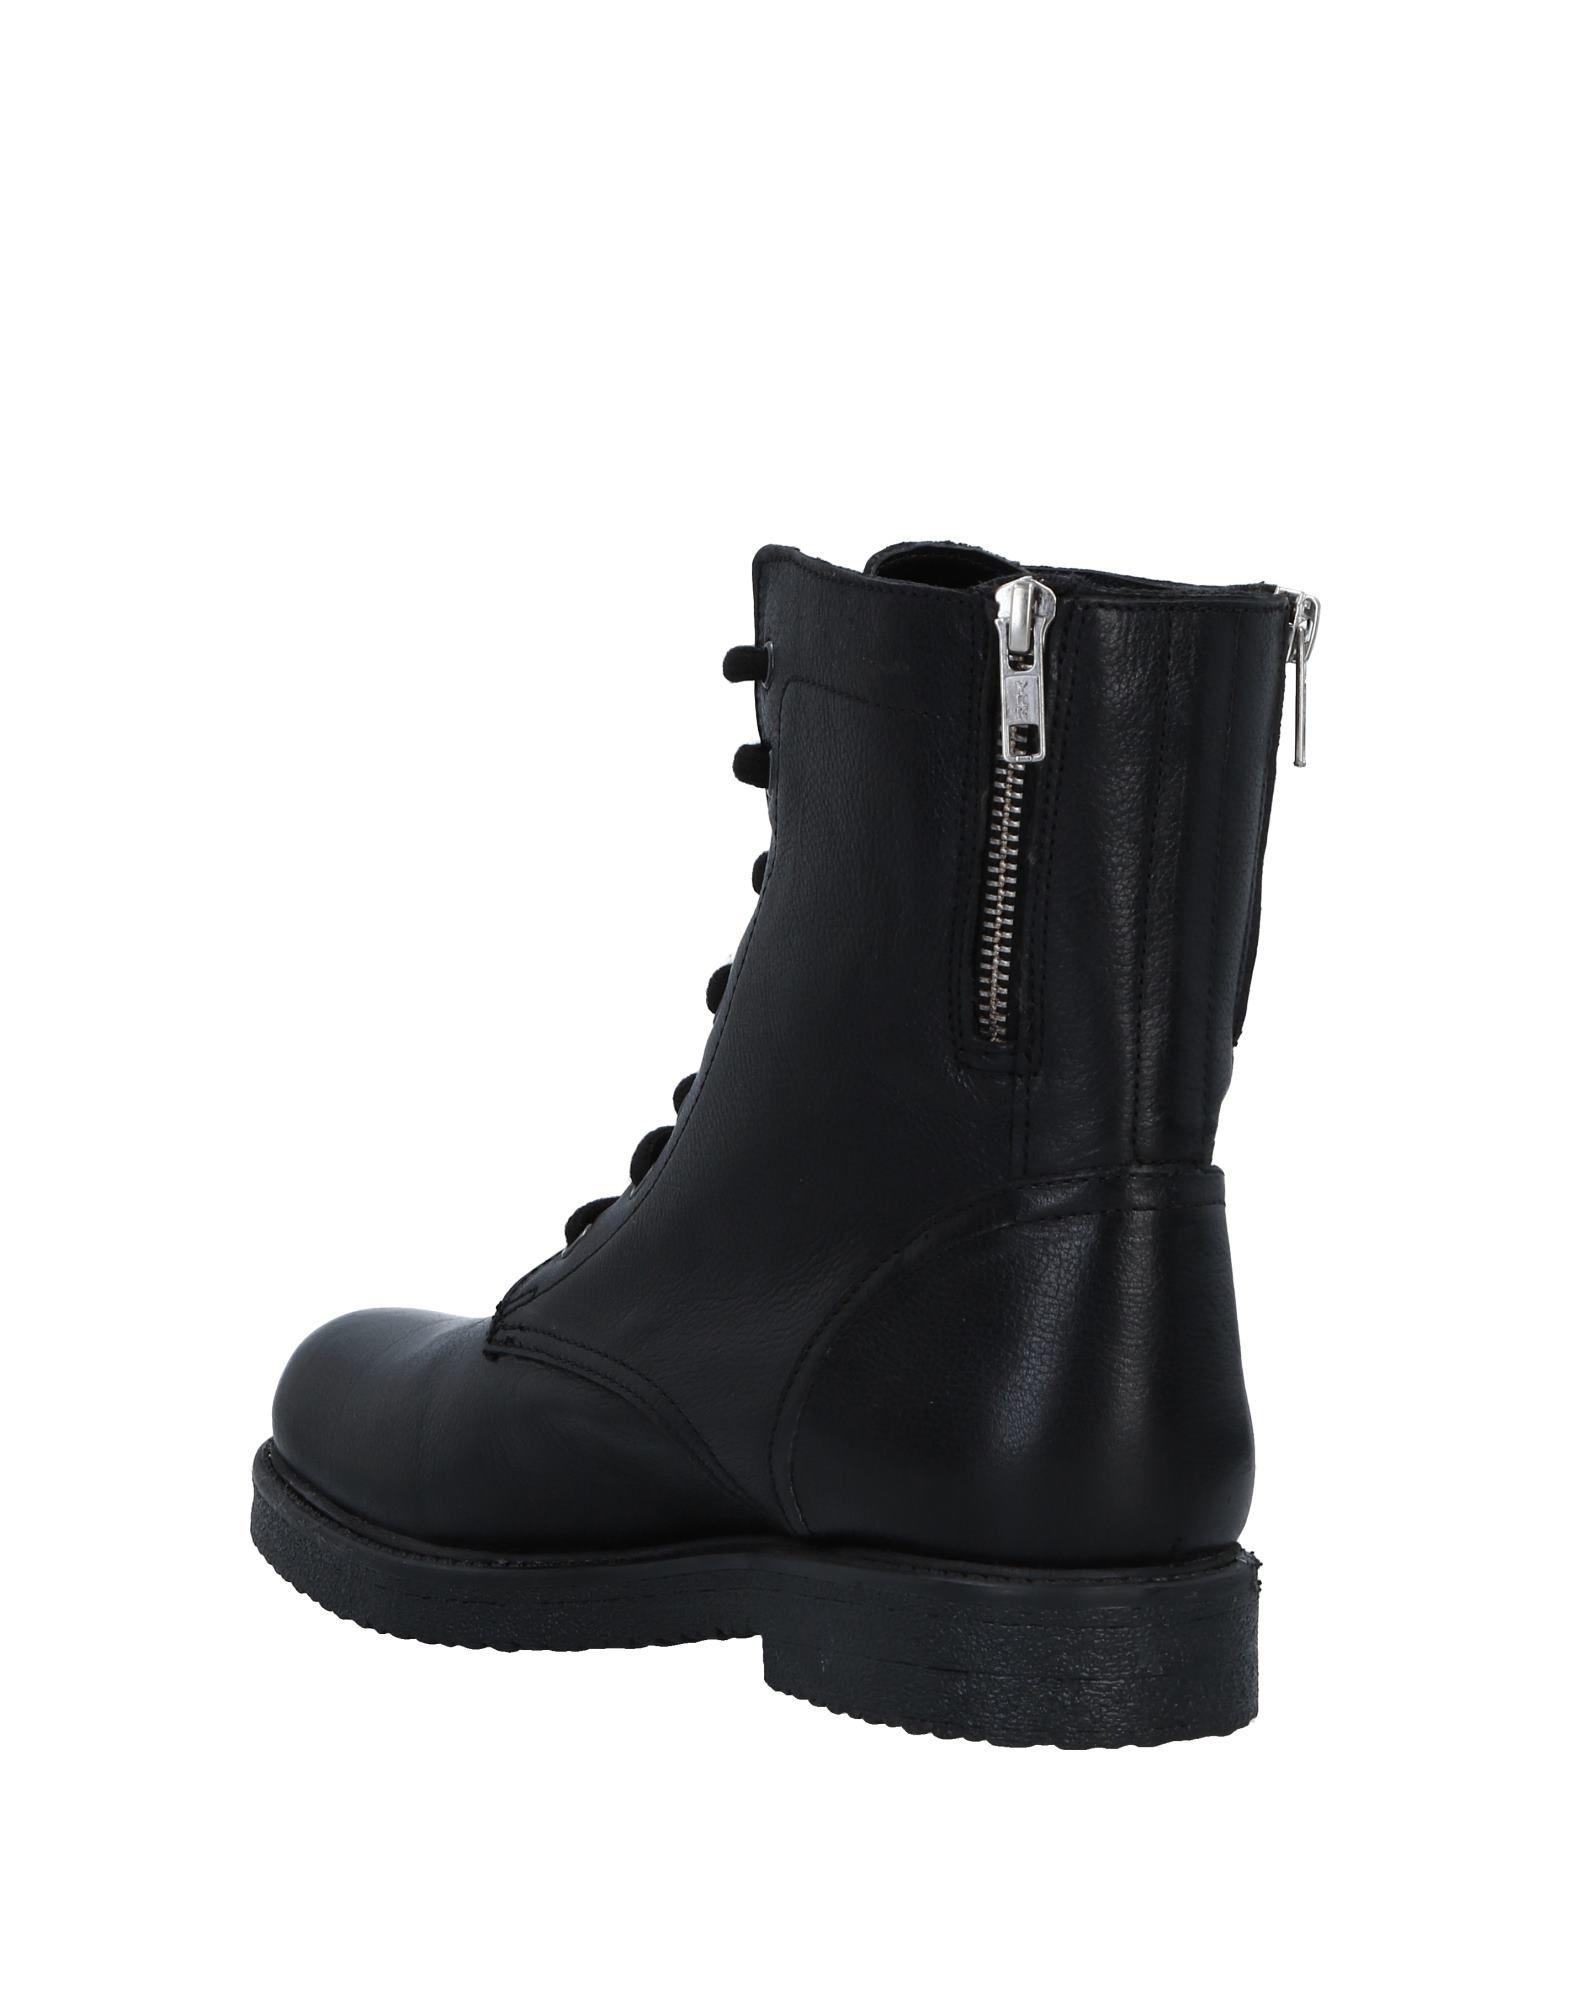 Roberto Della Croce Ankle Boot - Women Women Women Roberto Della Croce Ankle Boots online on  United Kingdom - 11525997JS a452ab